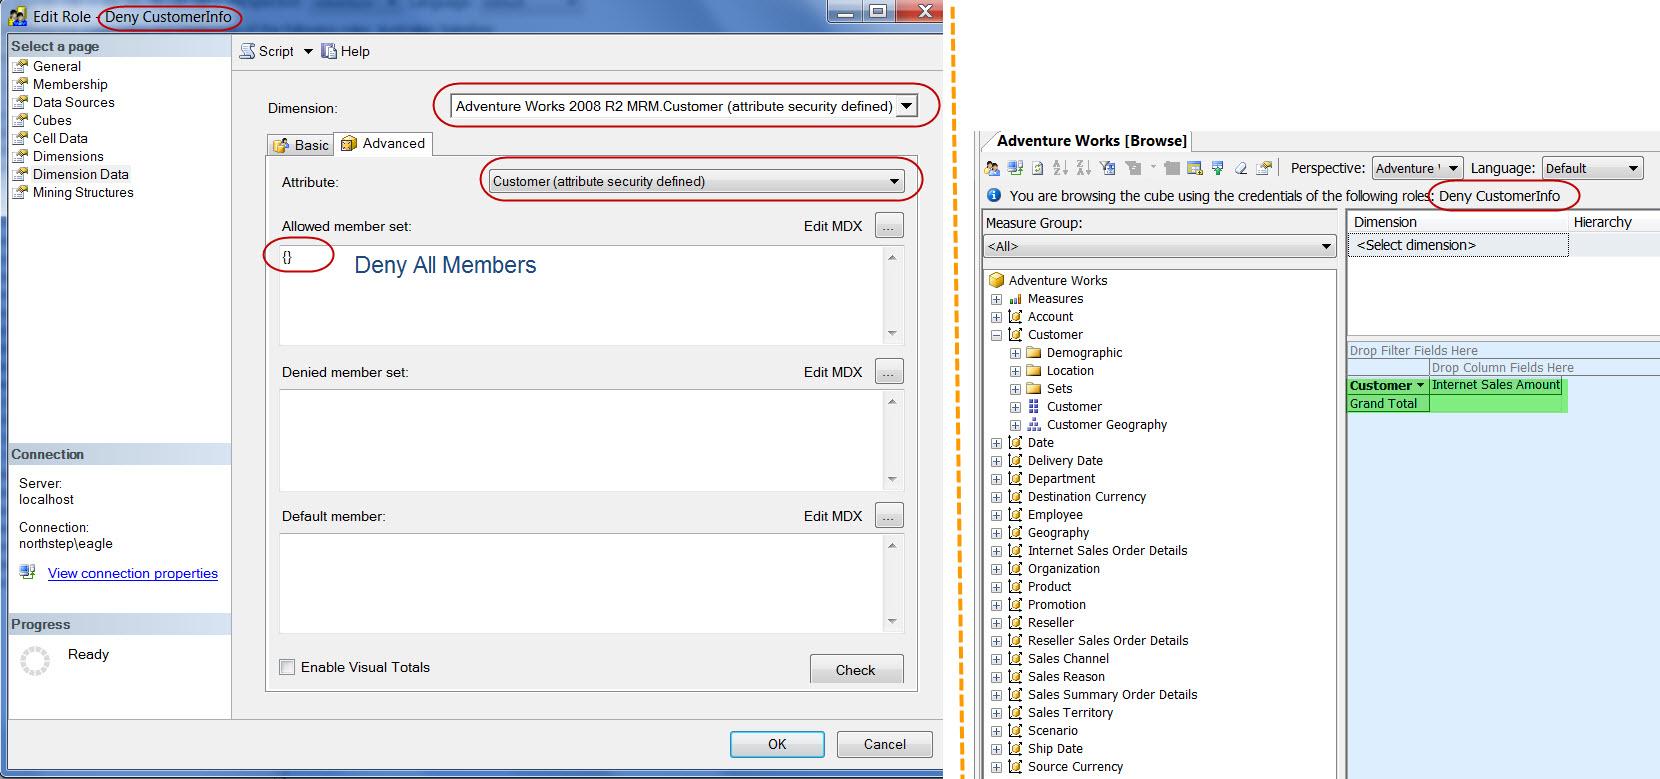 Screen Capture 2 - Deny CustomerInfo Role